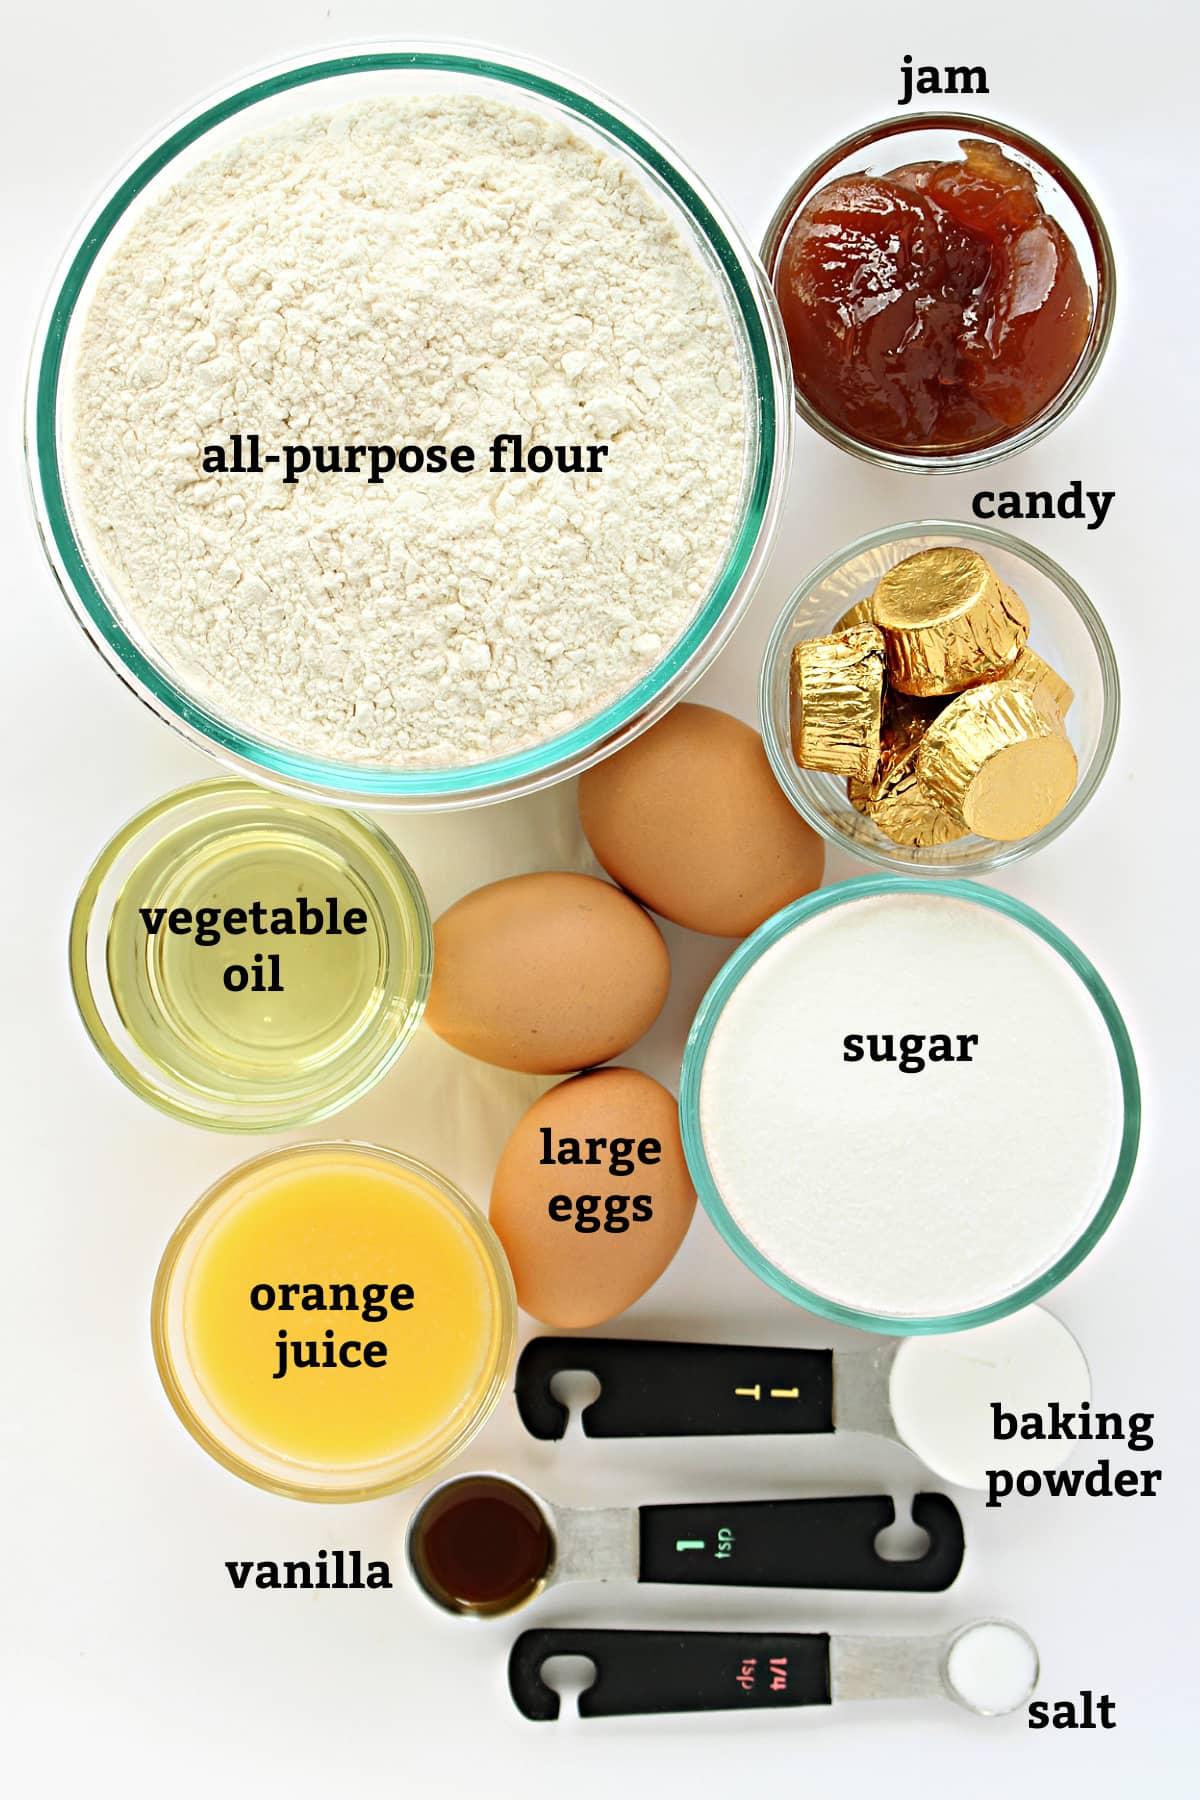 Recipe ingredients with text for jam, candy, flour, oil, eggs, sugar, juice, vanilla, baking powder, salt.